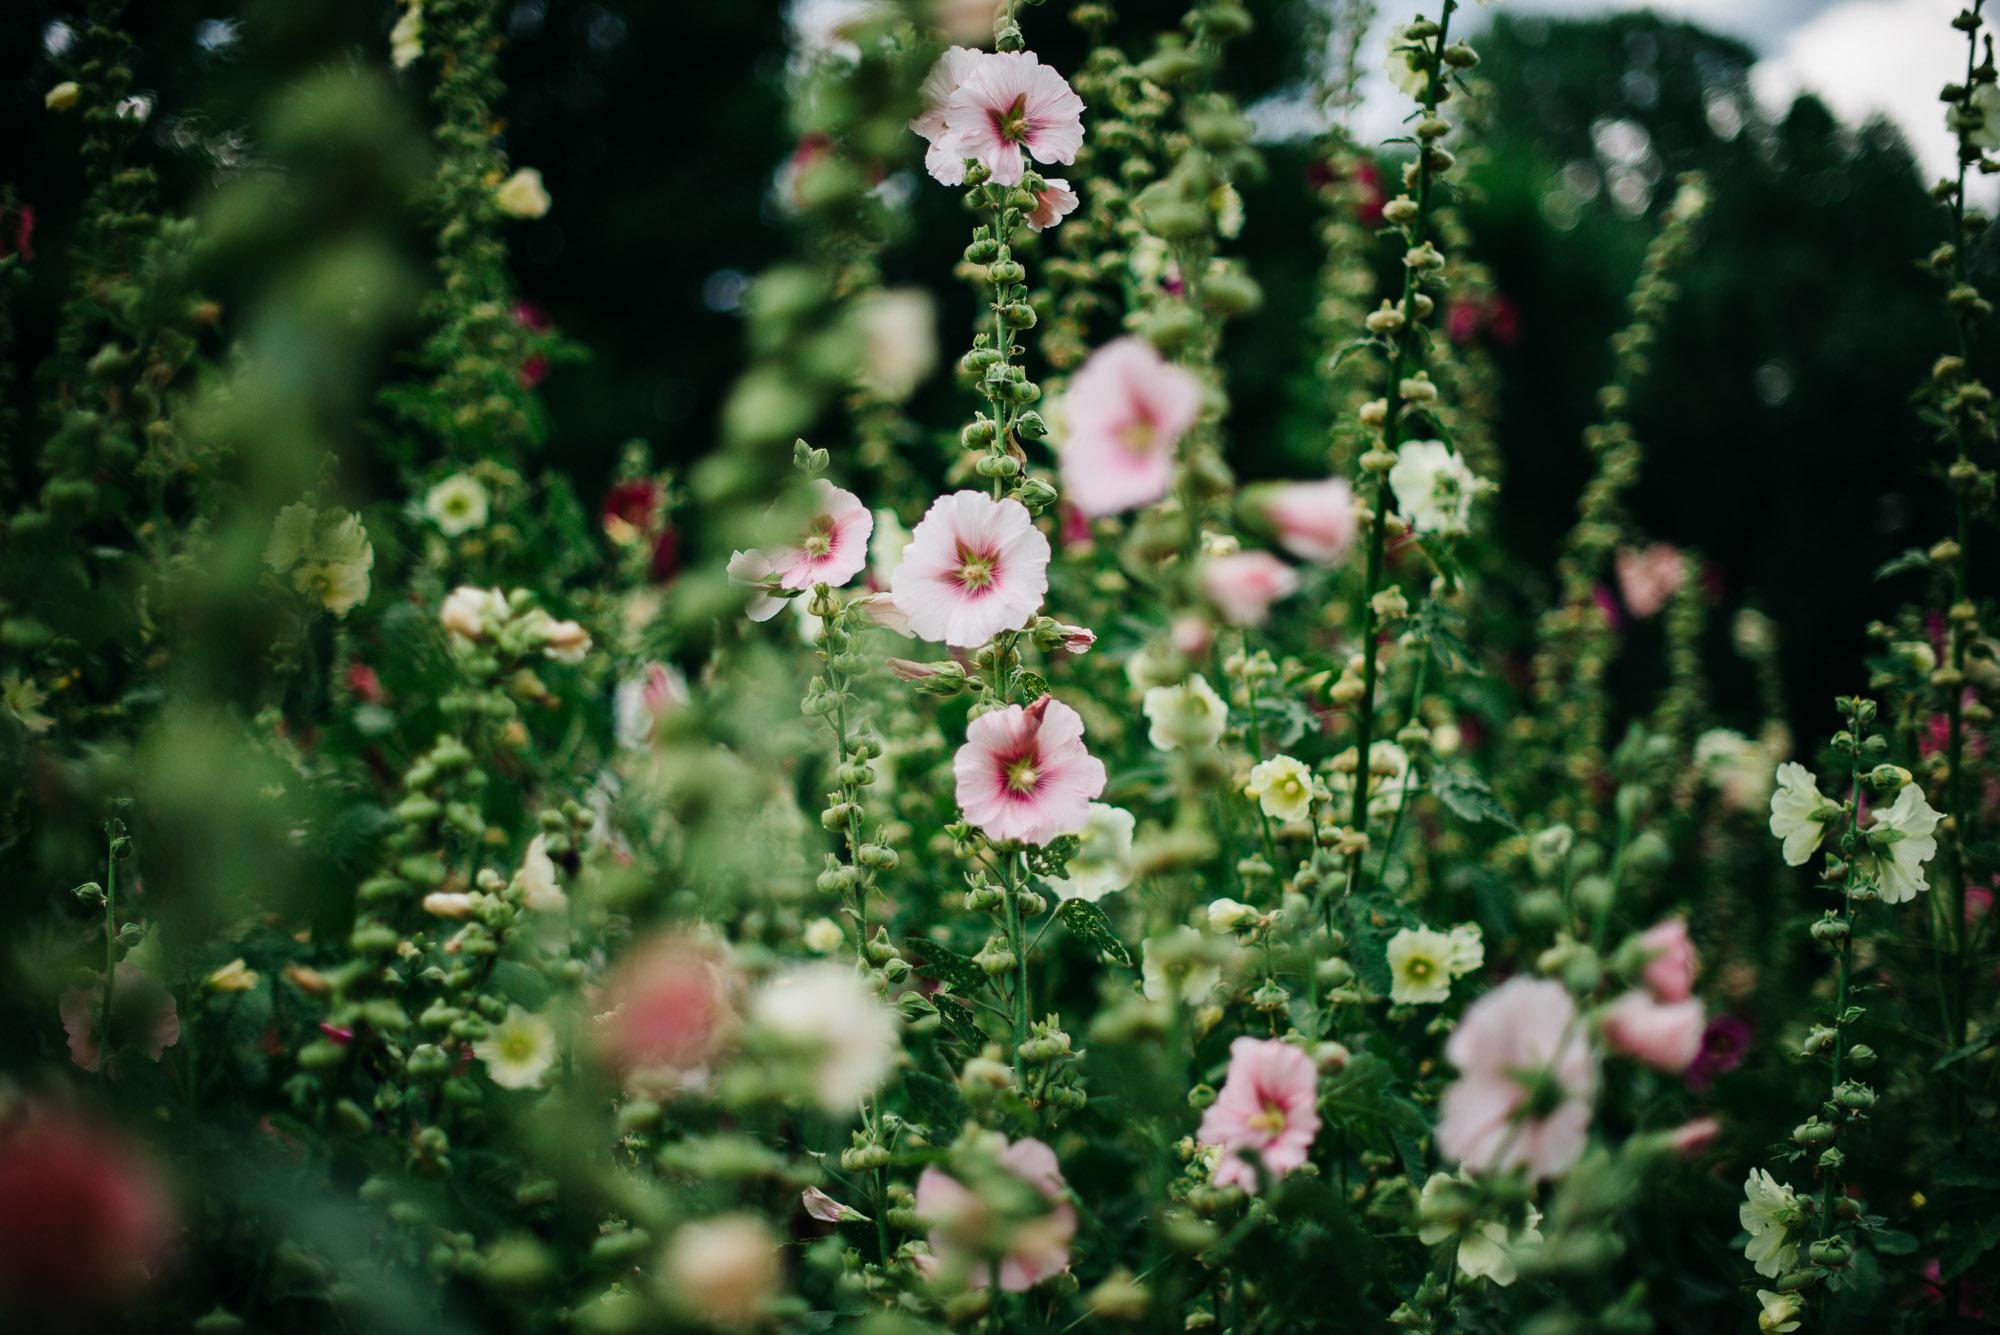 86elopement-photographer-colorado-lyons-farmette-wedding-amy&ben-2194.jpg